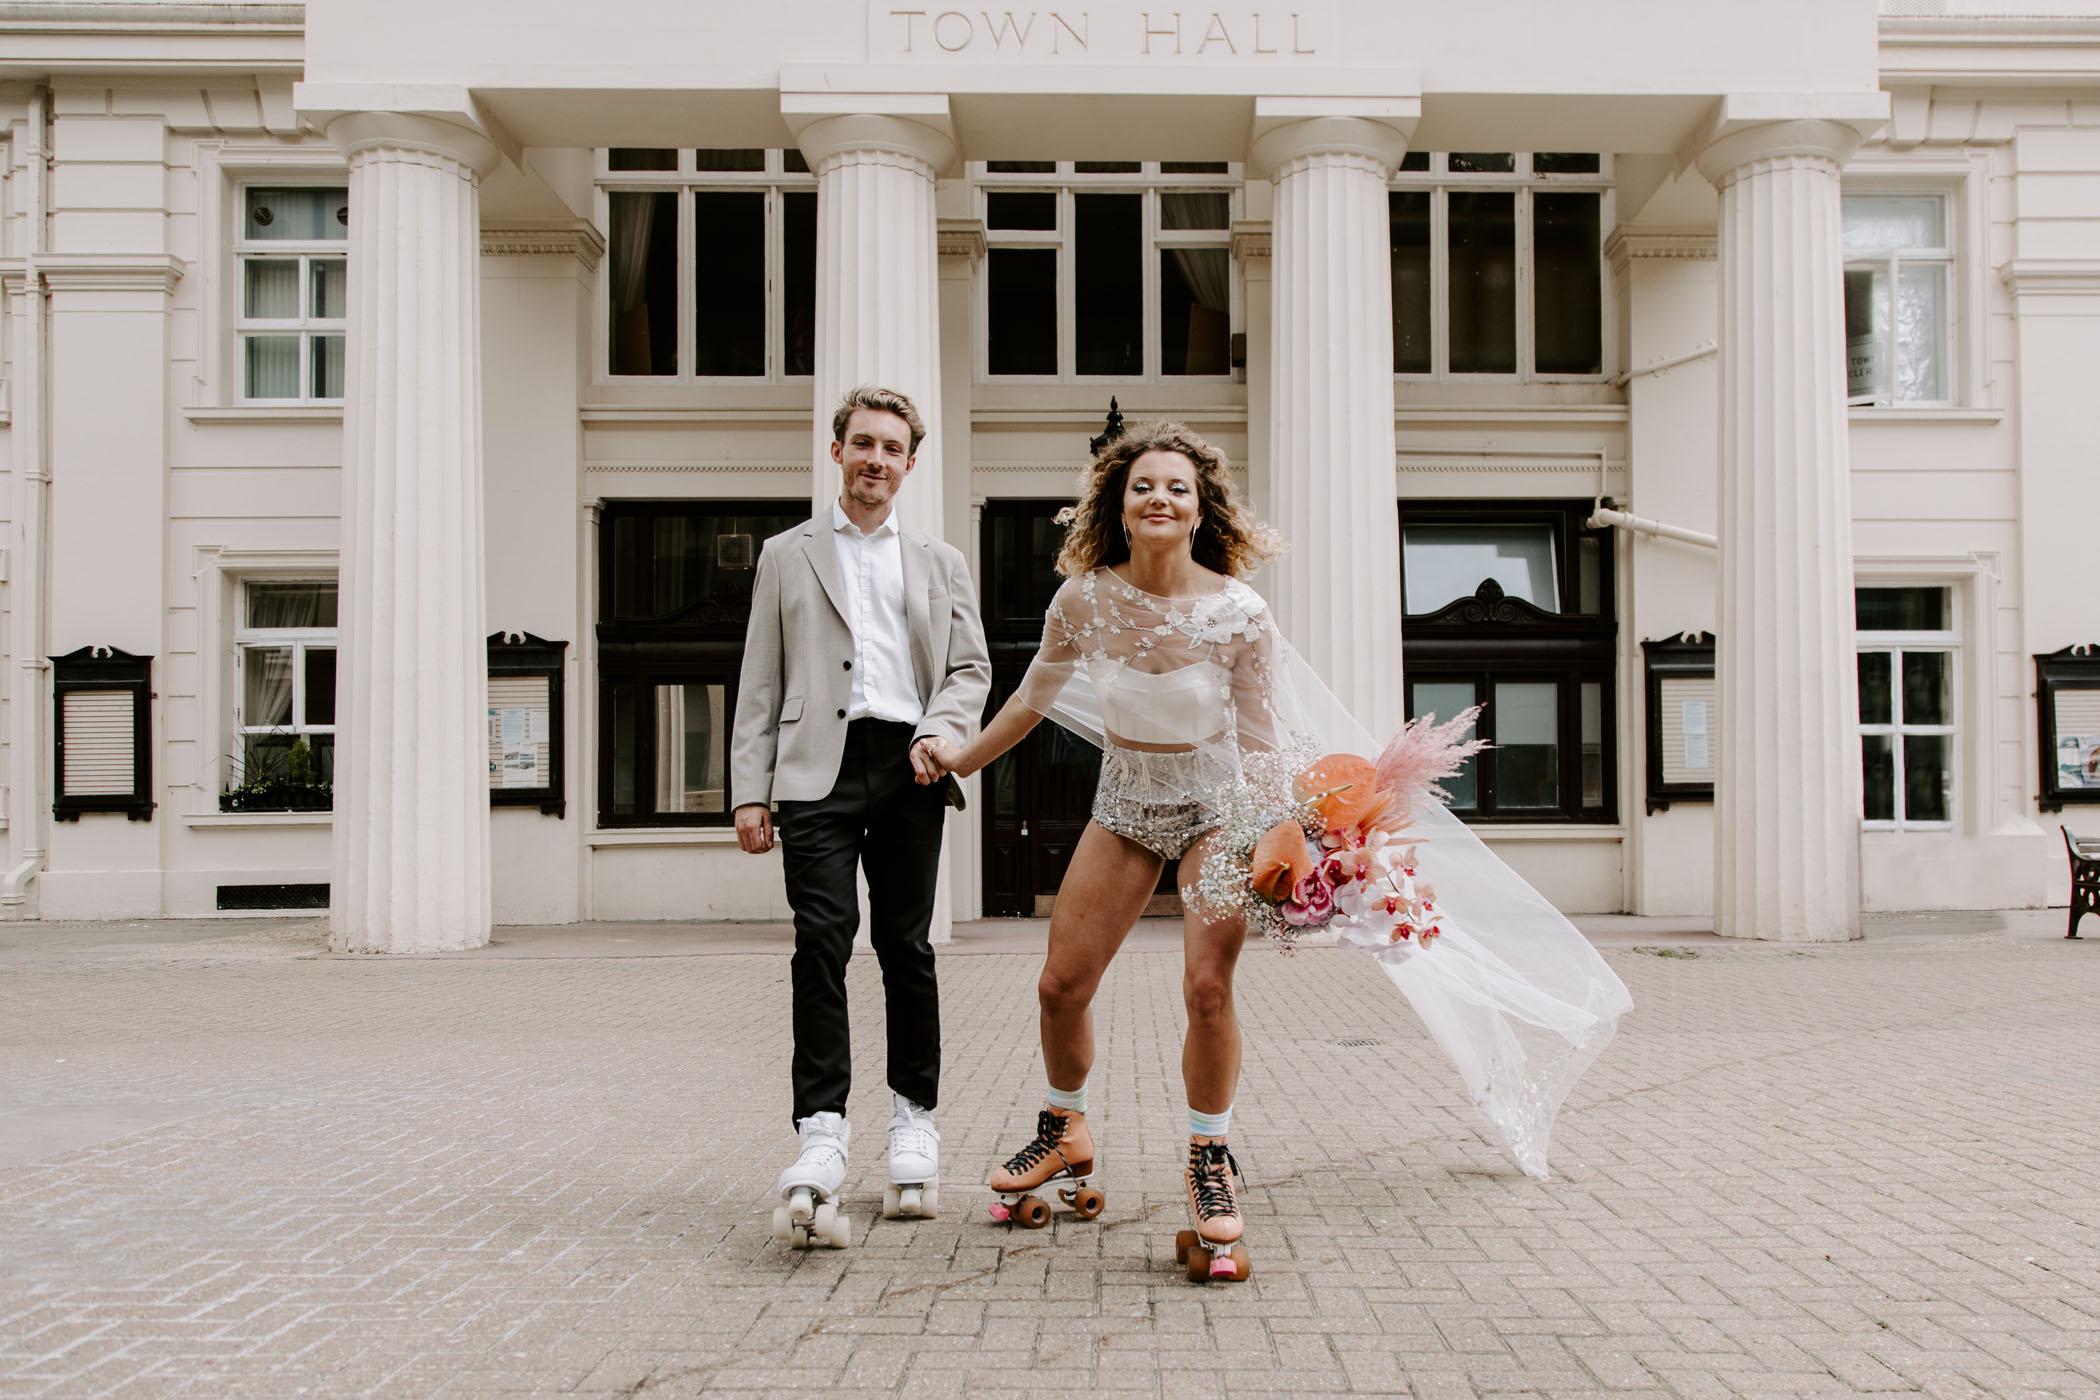 courthouse wedding on roller skates